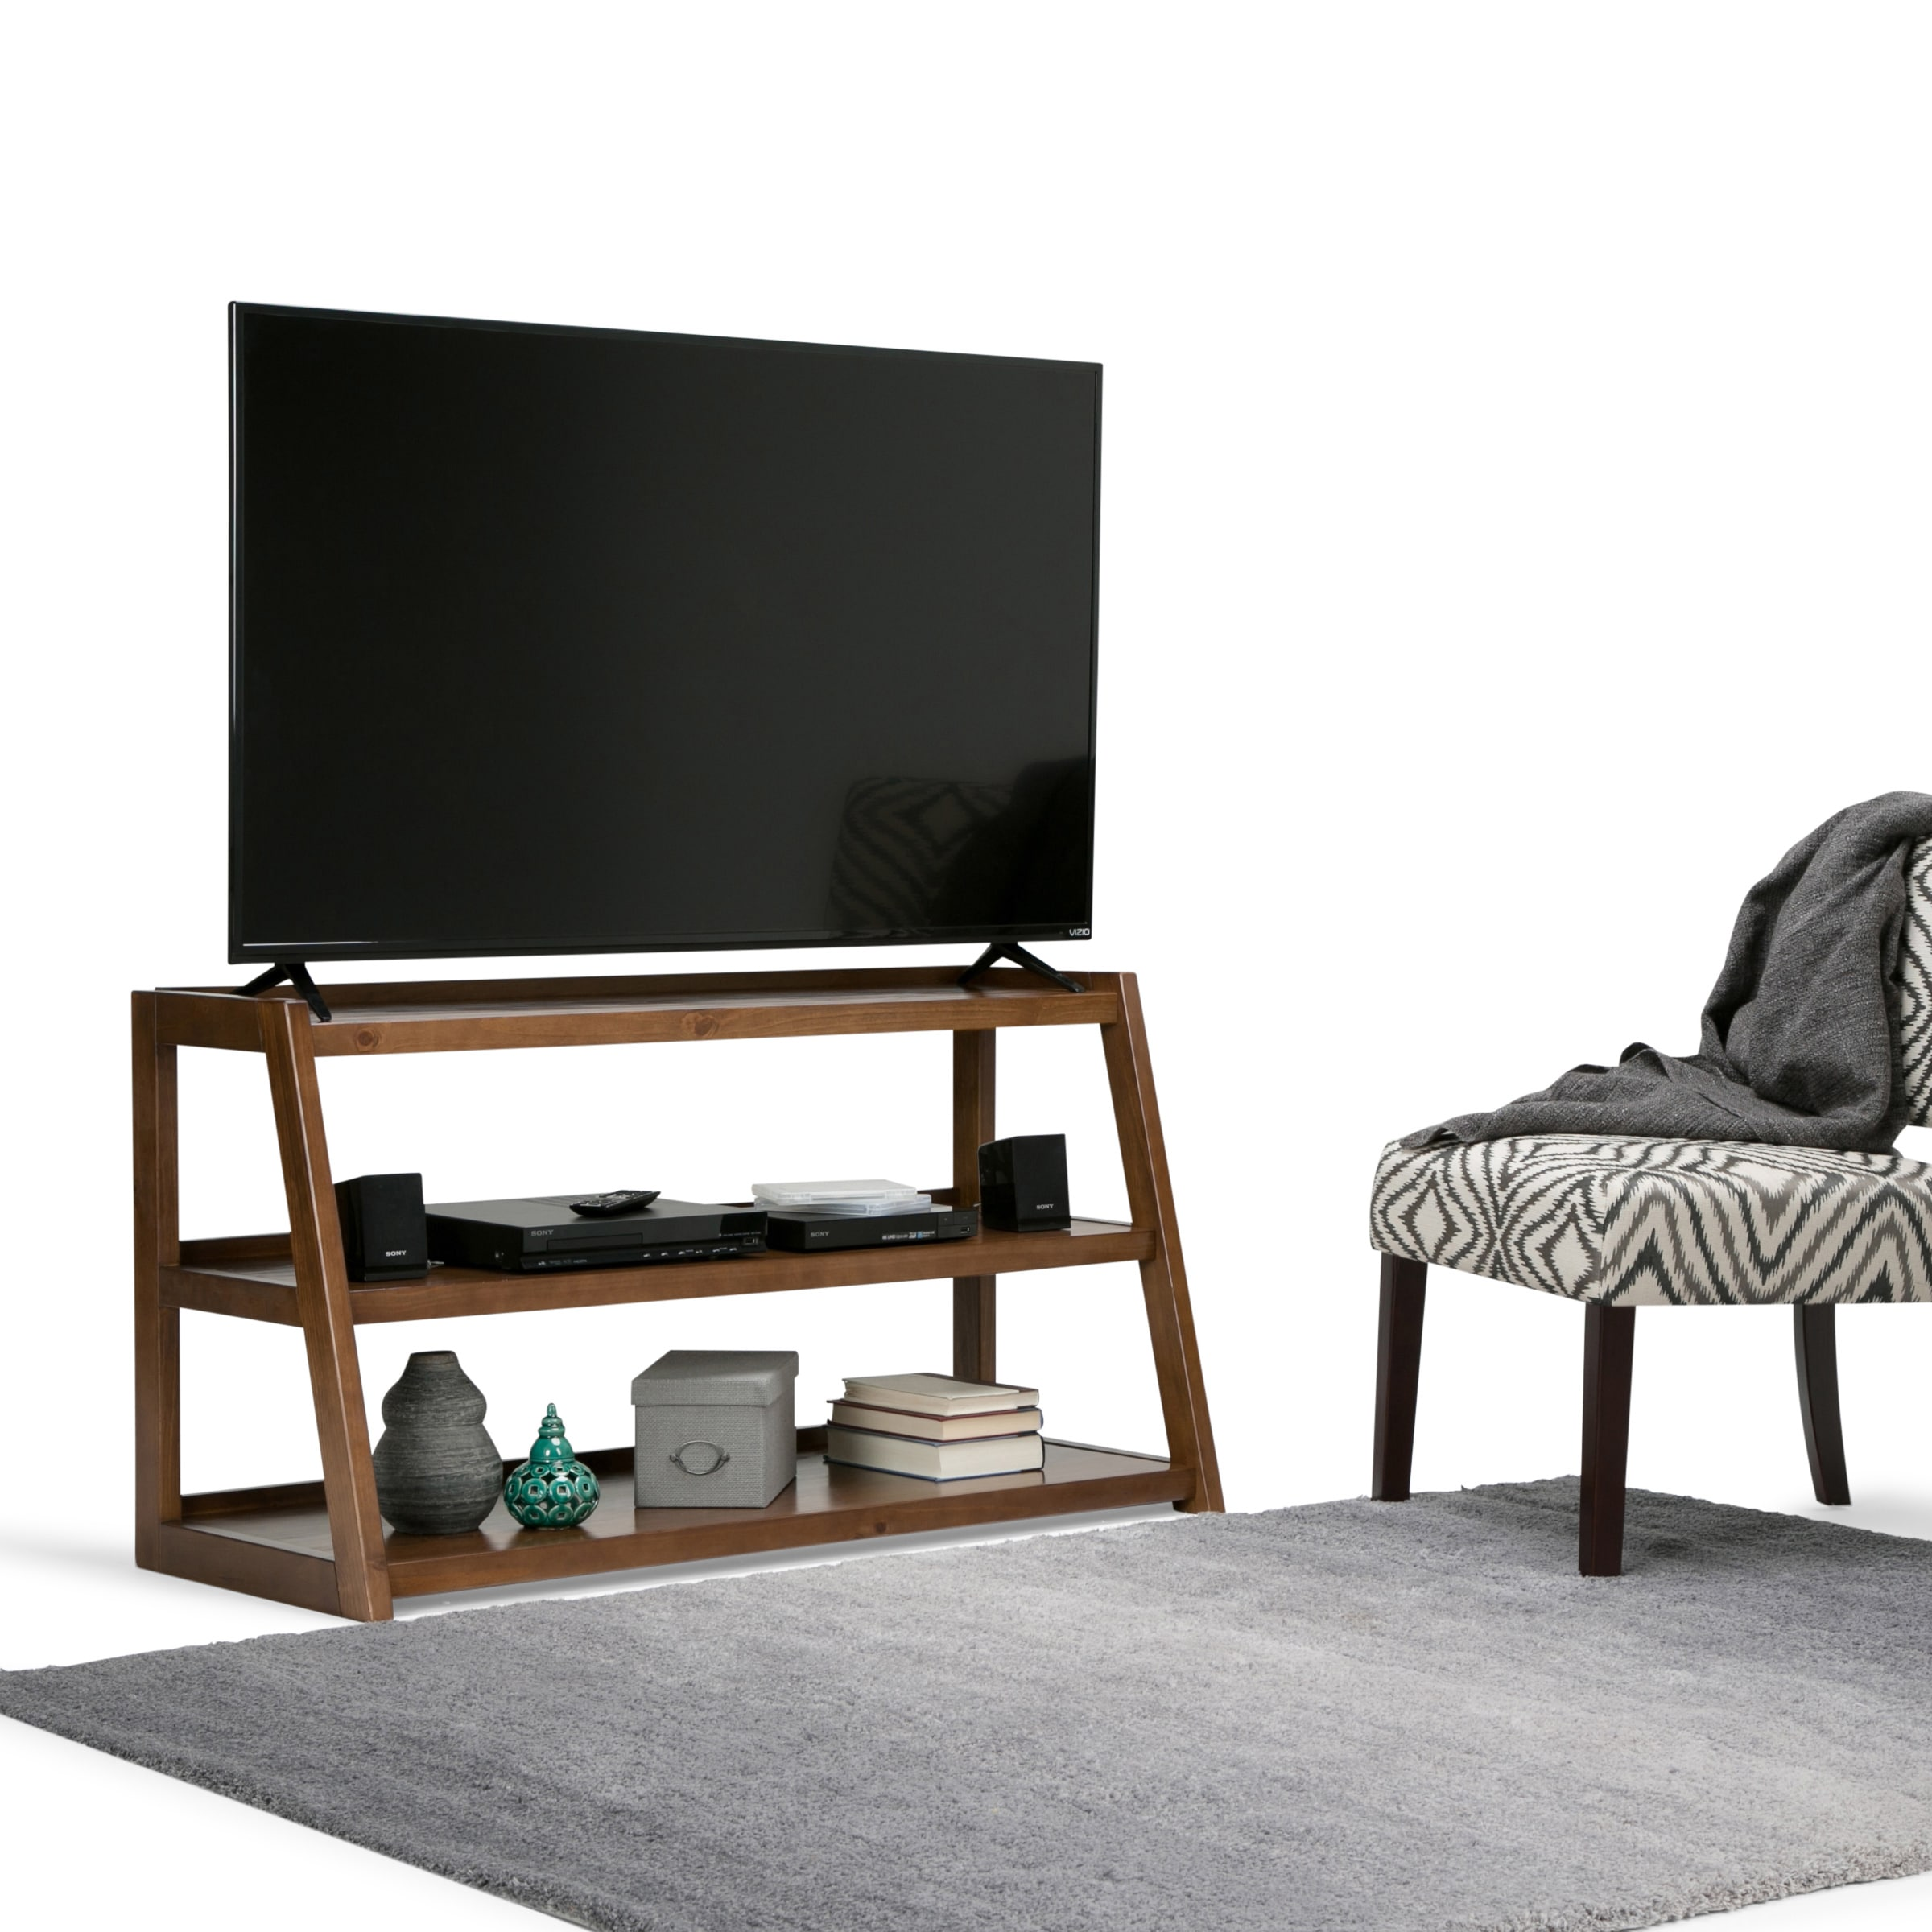 Greyson Living Laguna Antique White Panel Bed 6piece: Shop Carson Carrington Svendborg 48-inch Mid-century TV